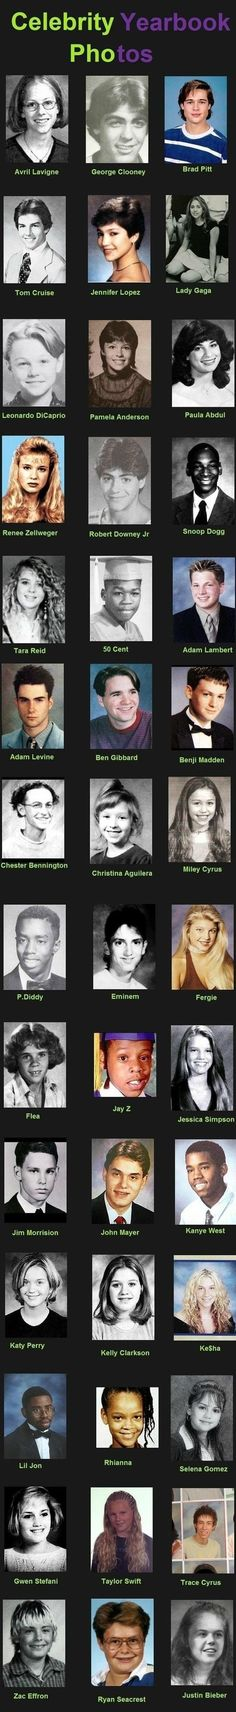 Celebrity Yearbook Photos - Imgur